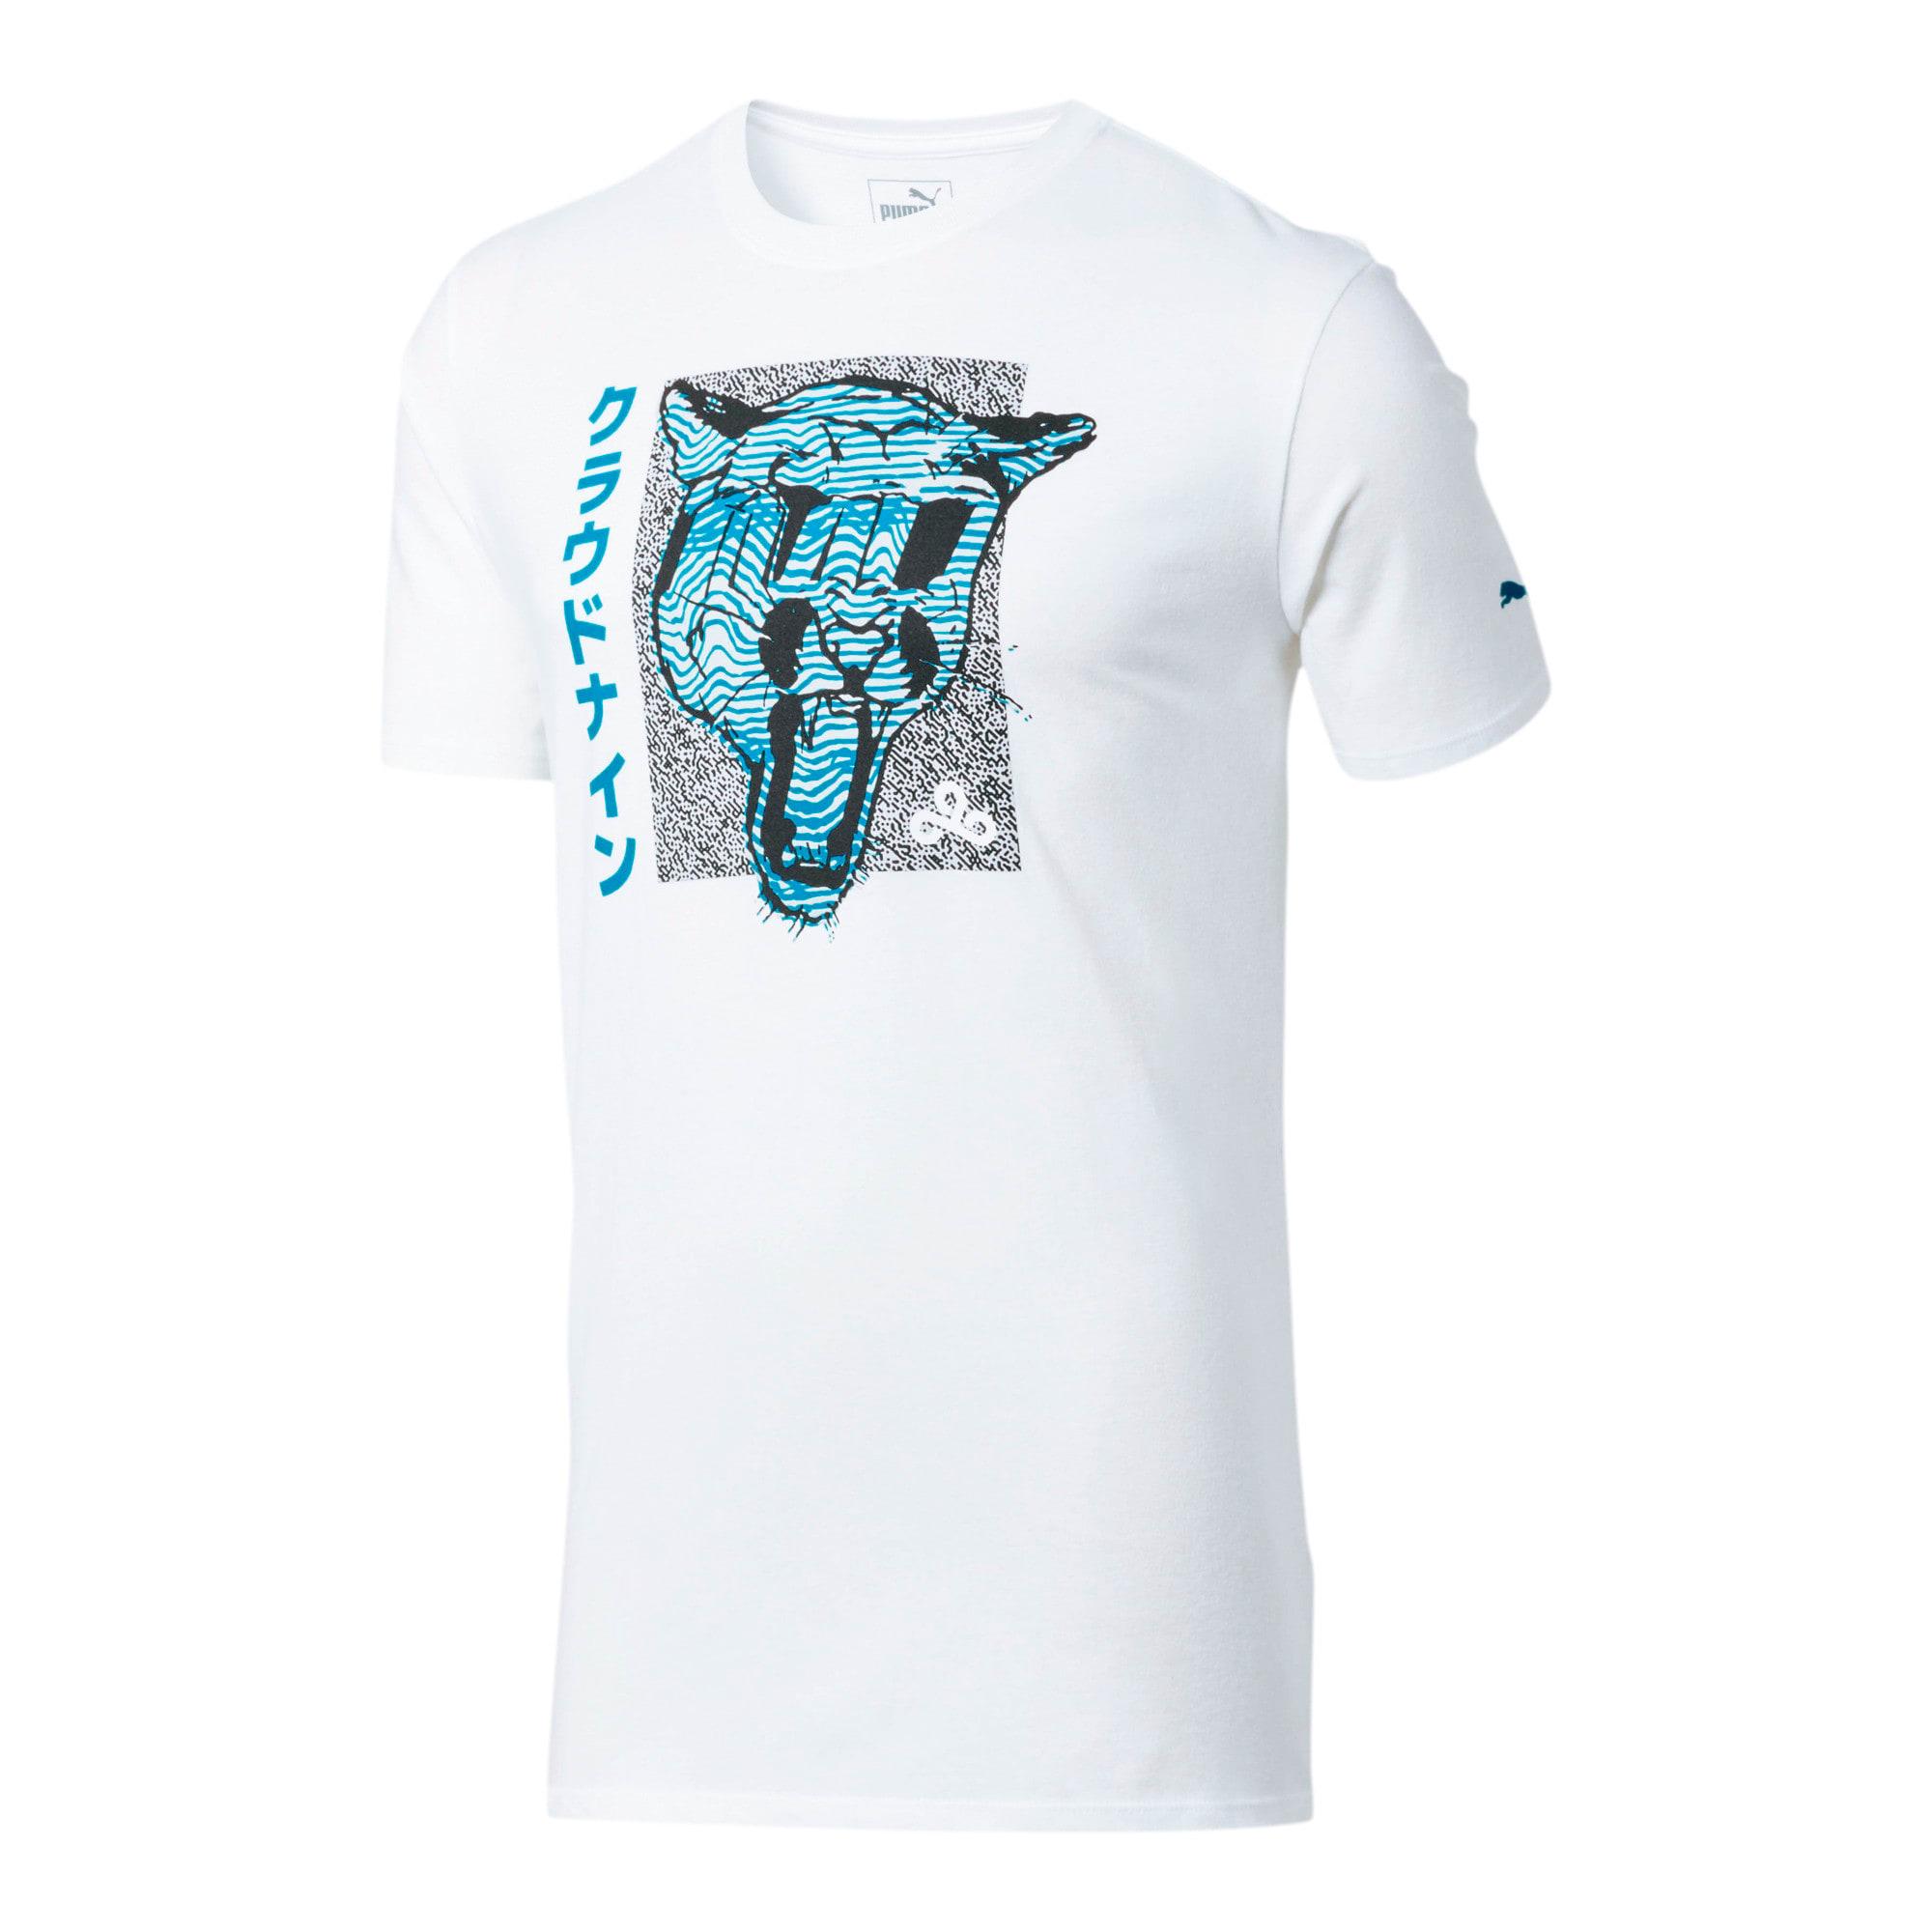 Miniatura 1 de Camiseta PUMA x CLOUD9 Big Cat , Puma White, mediano